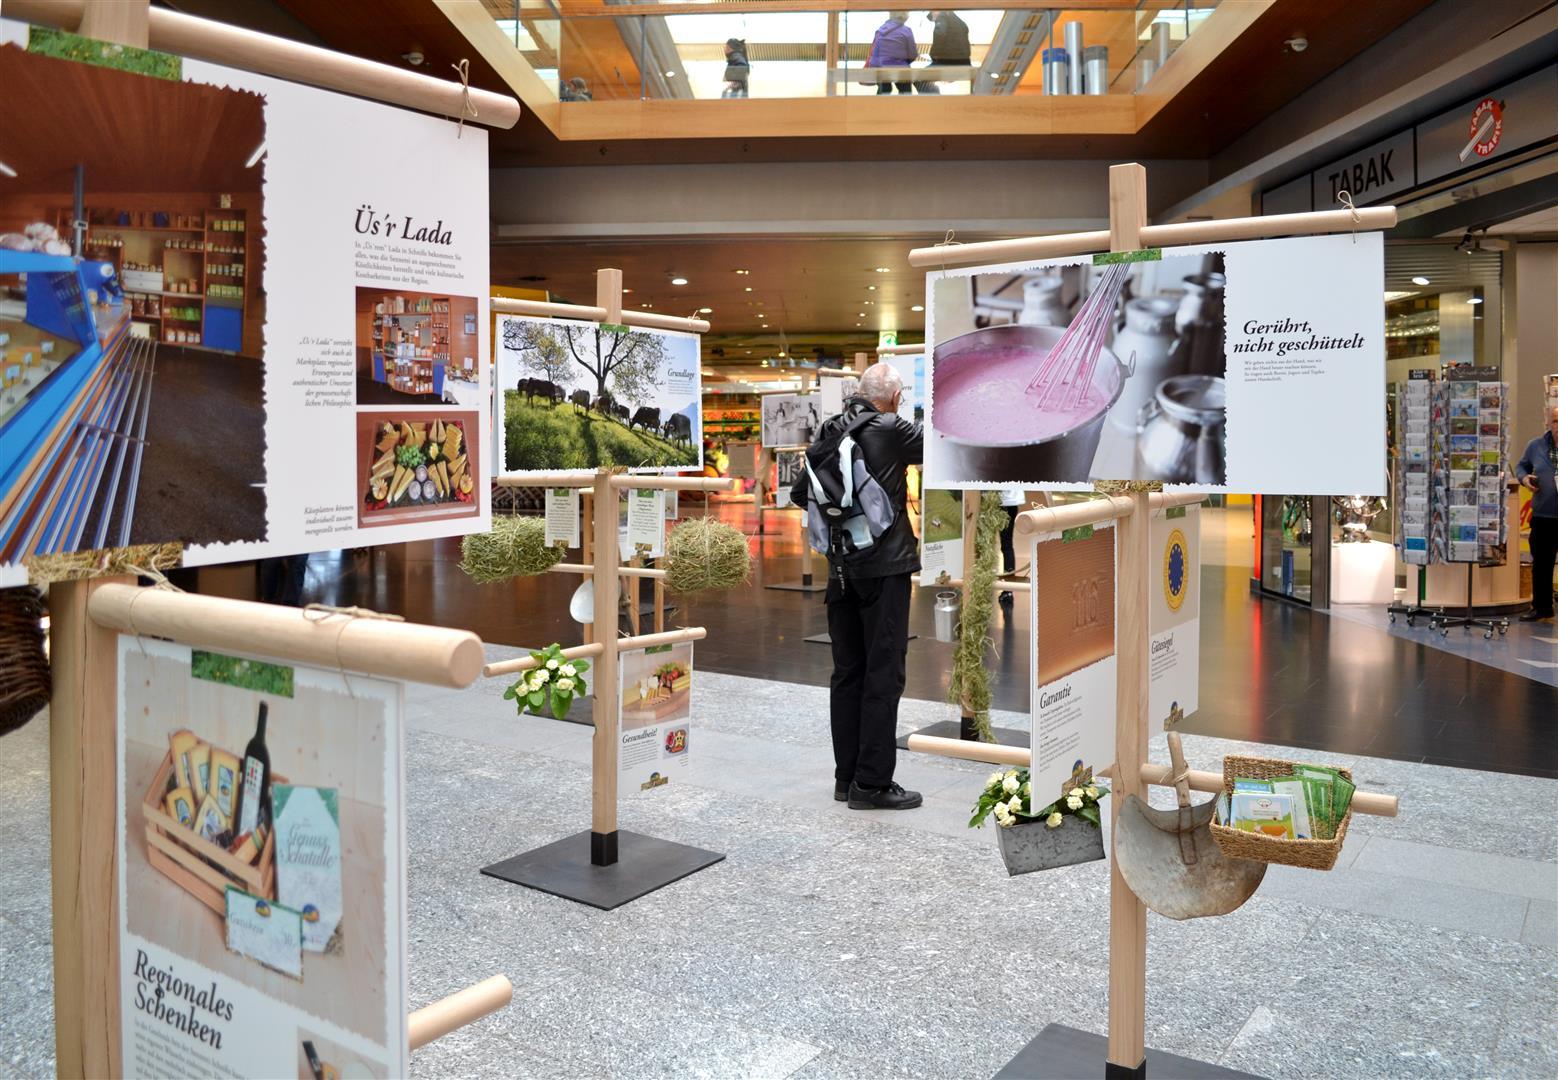 AusstellungZimbapark(2).jpg